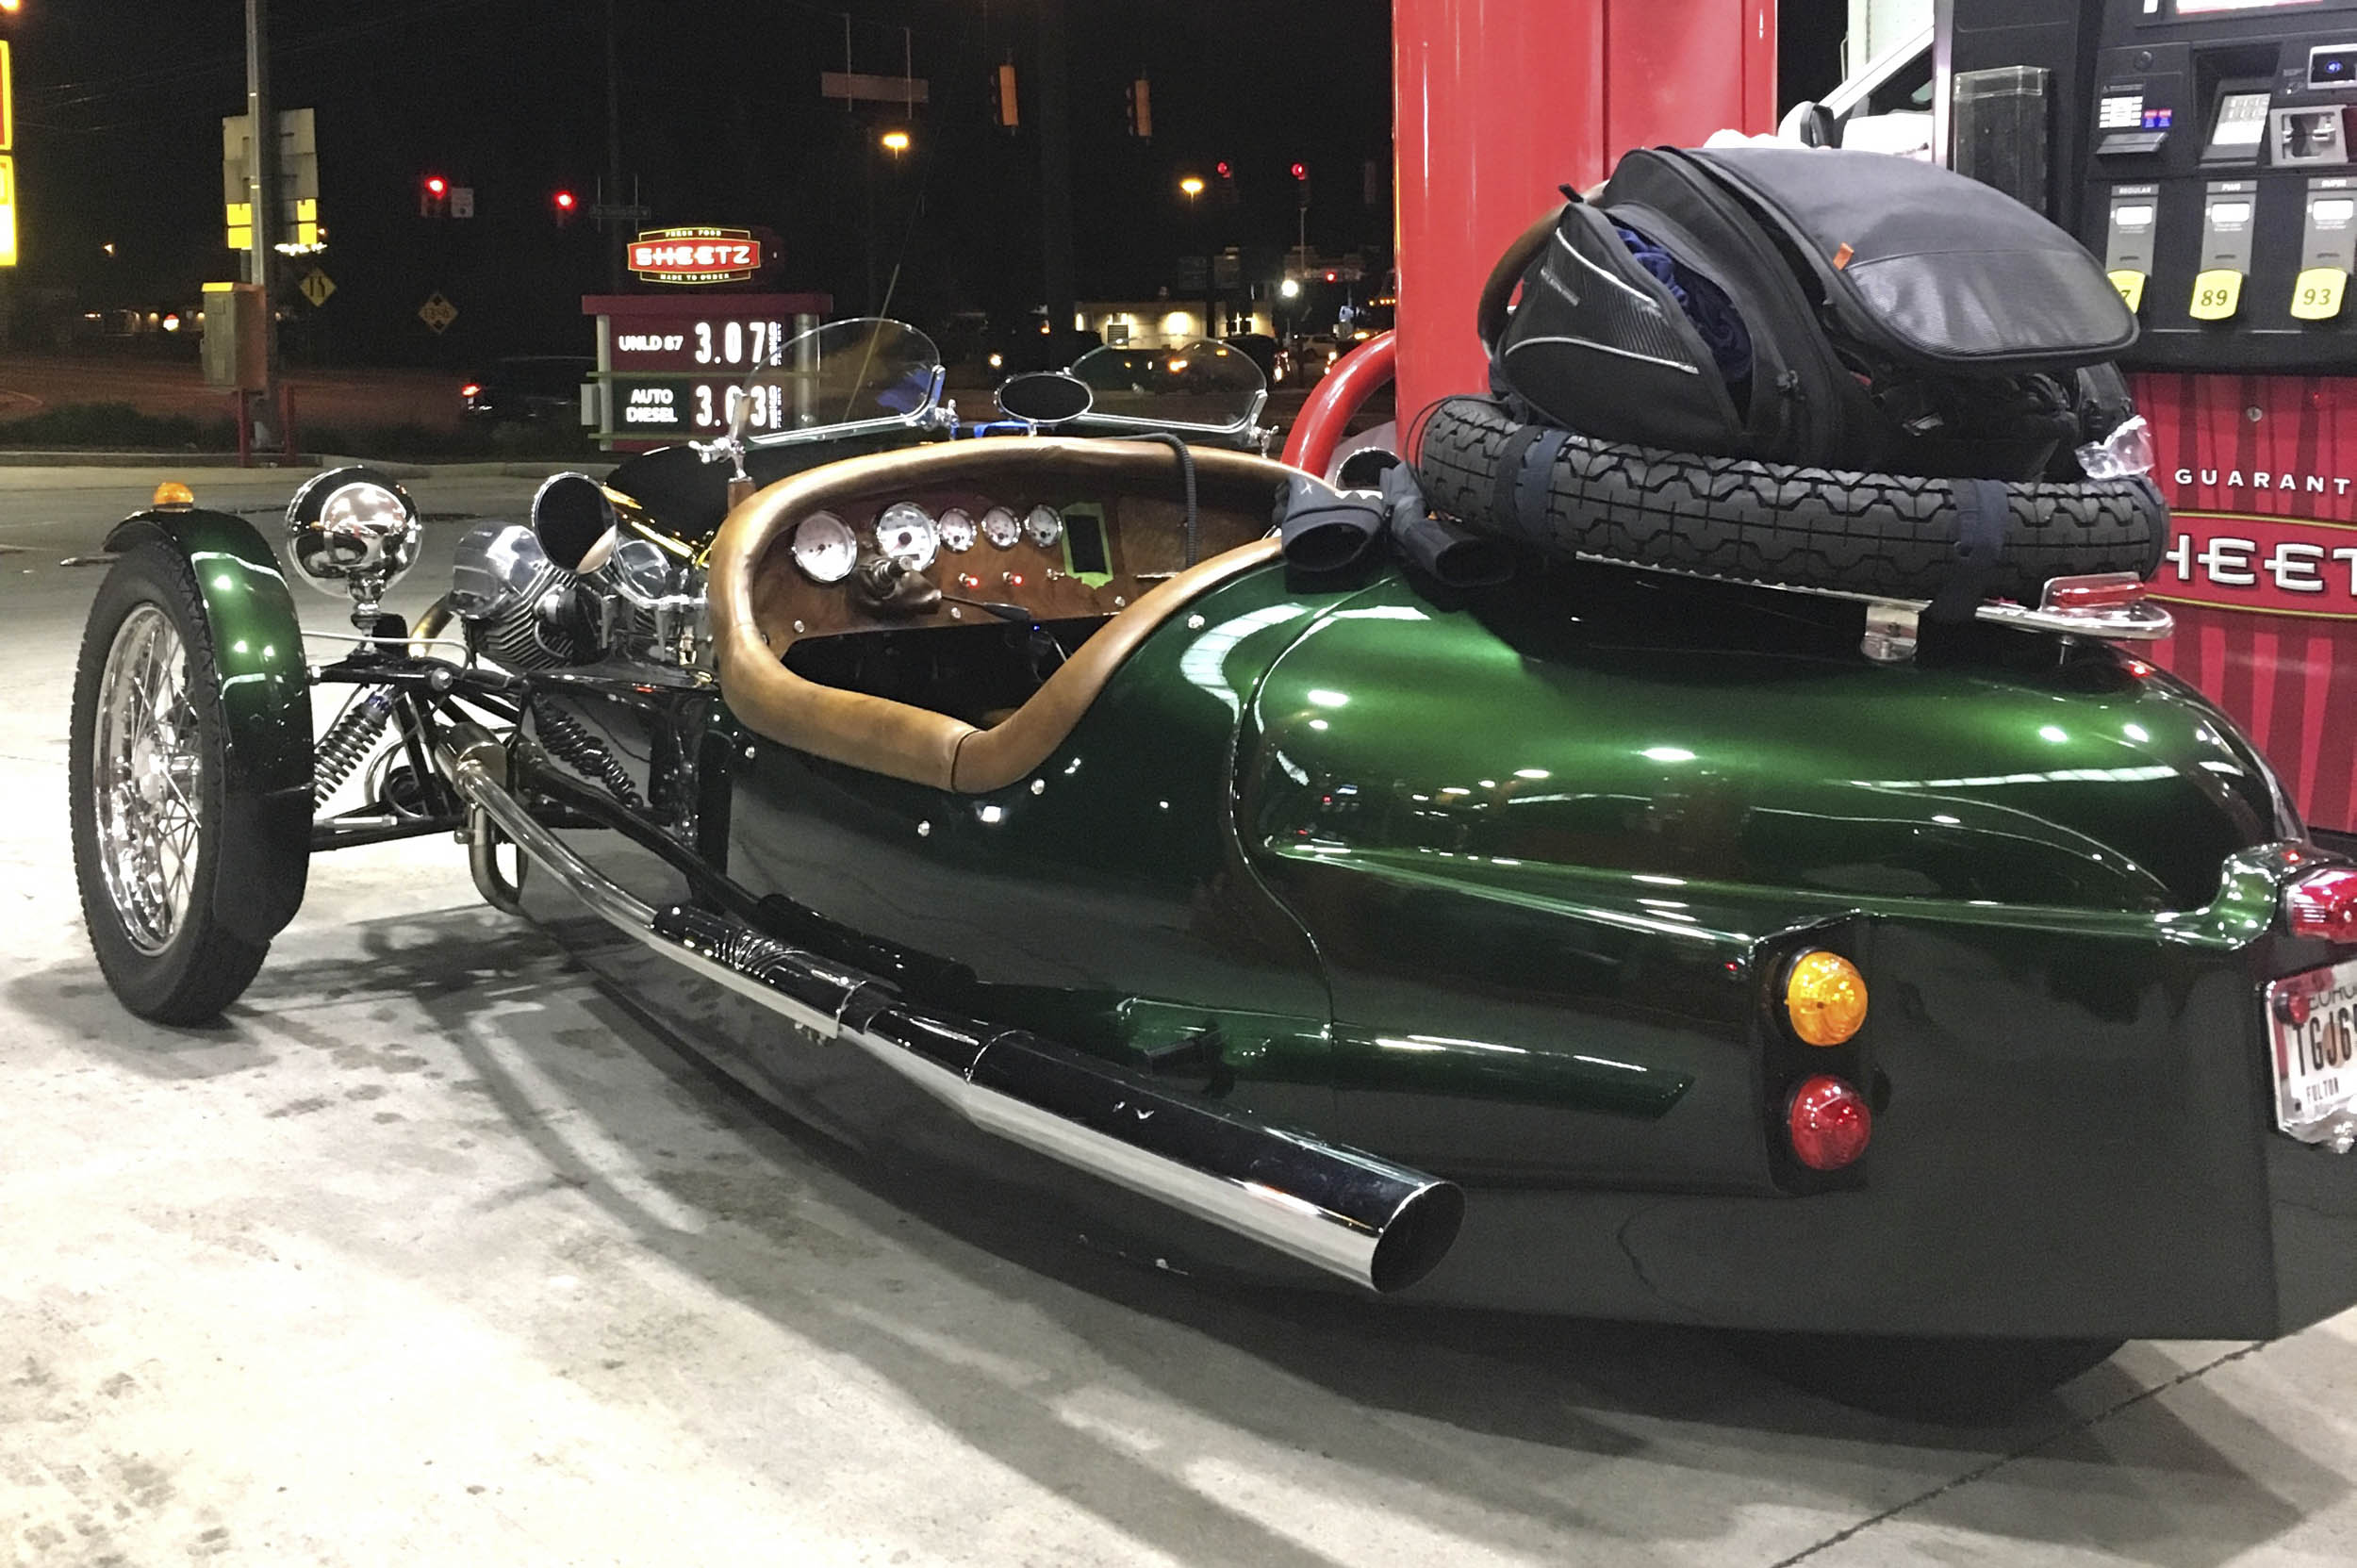 Road Trip gas stop